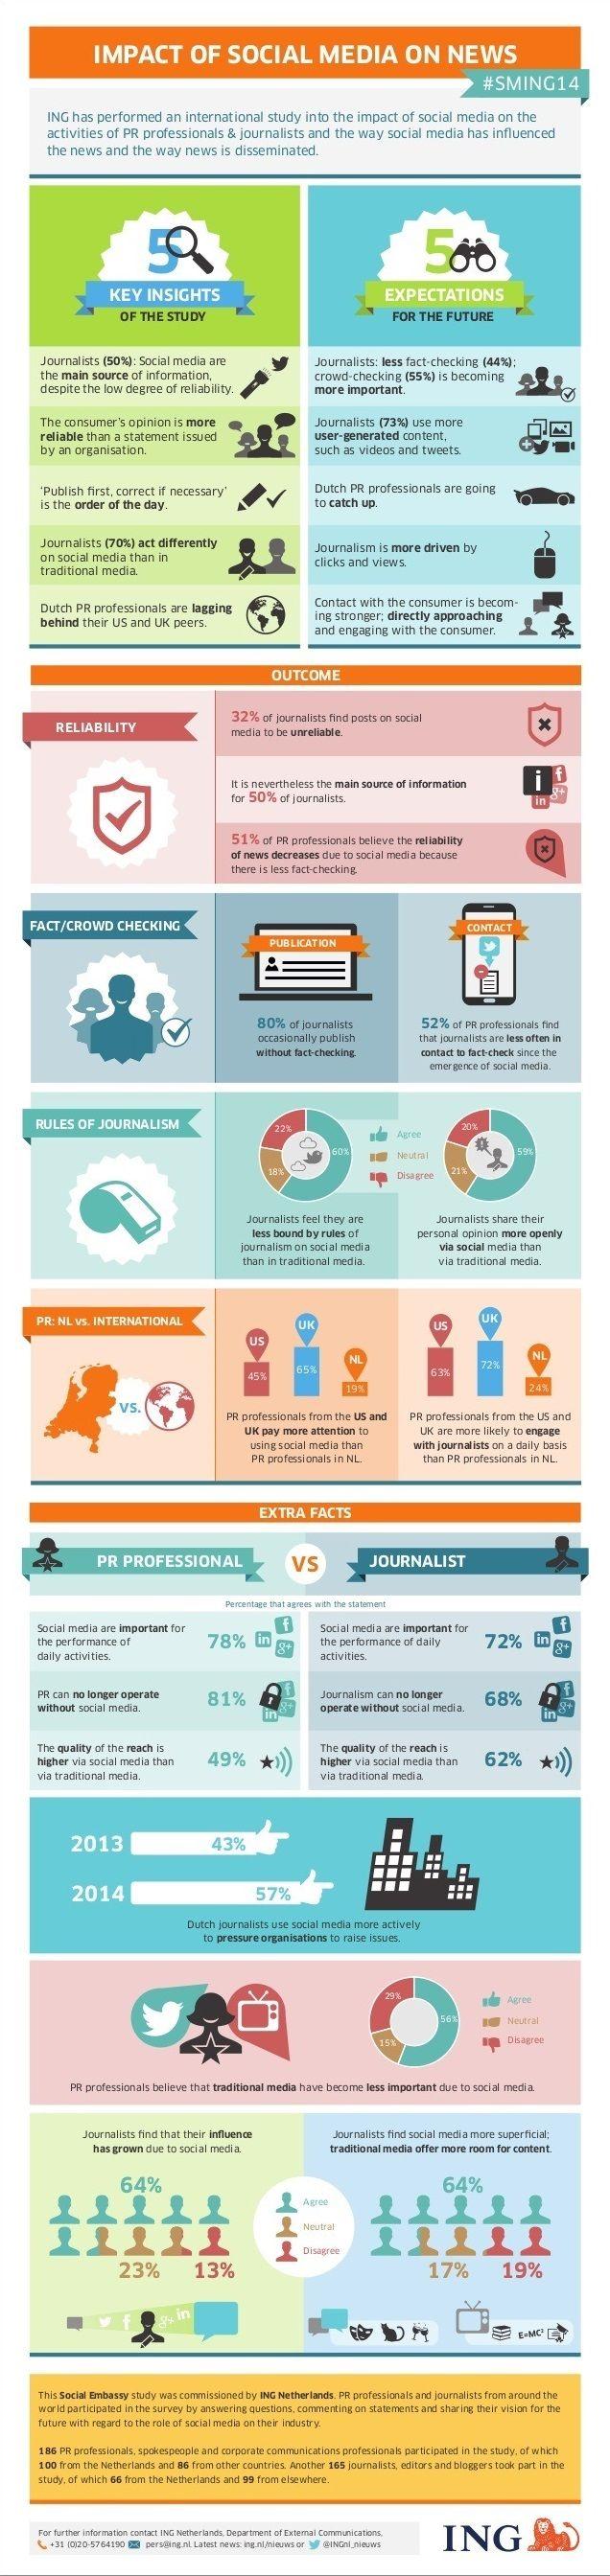 infografia_impact_social_media_news_430_techenet